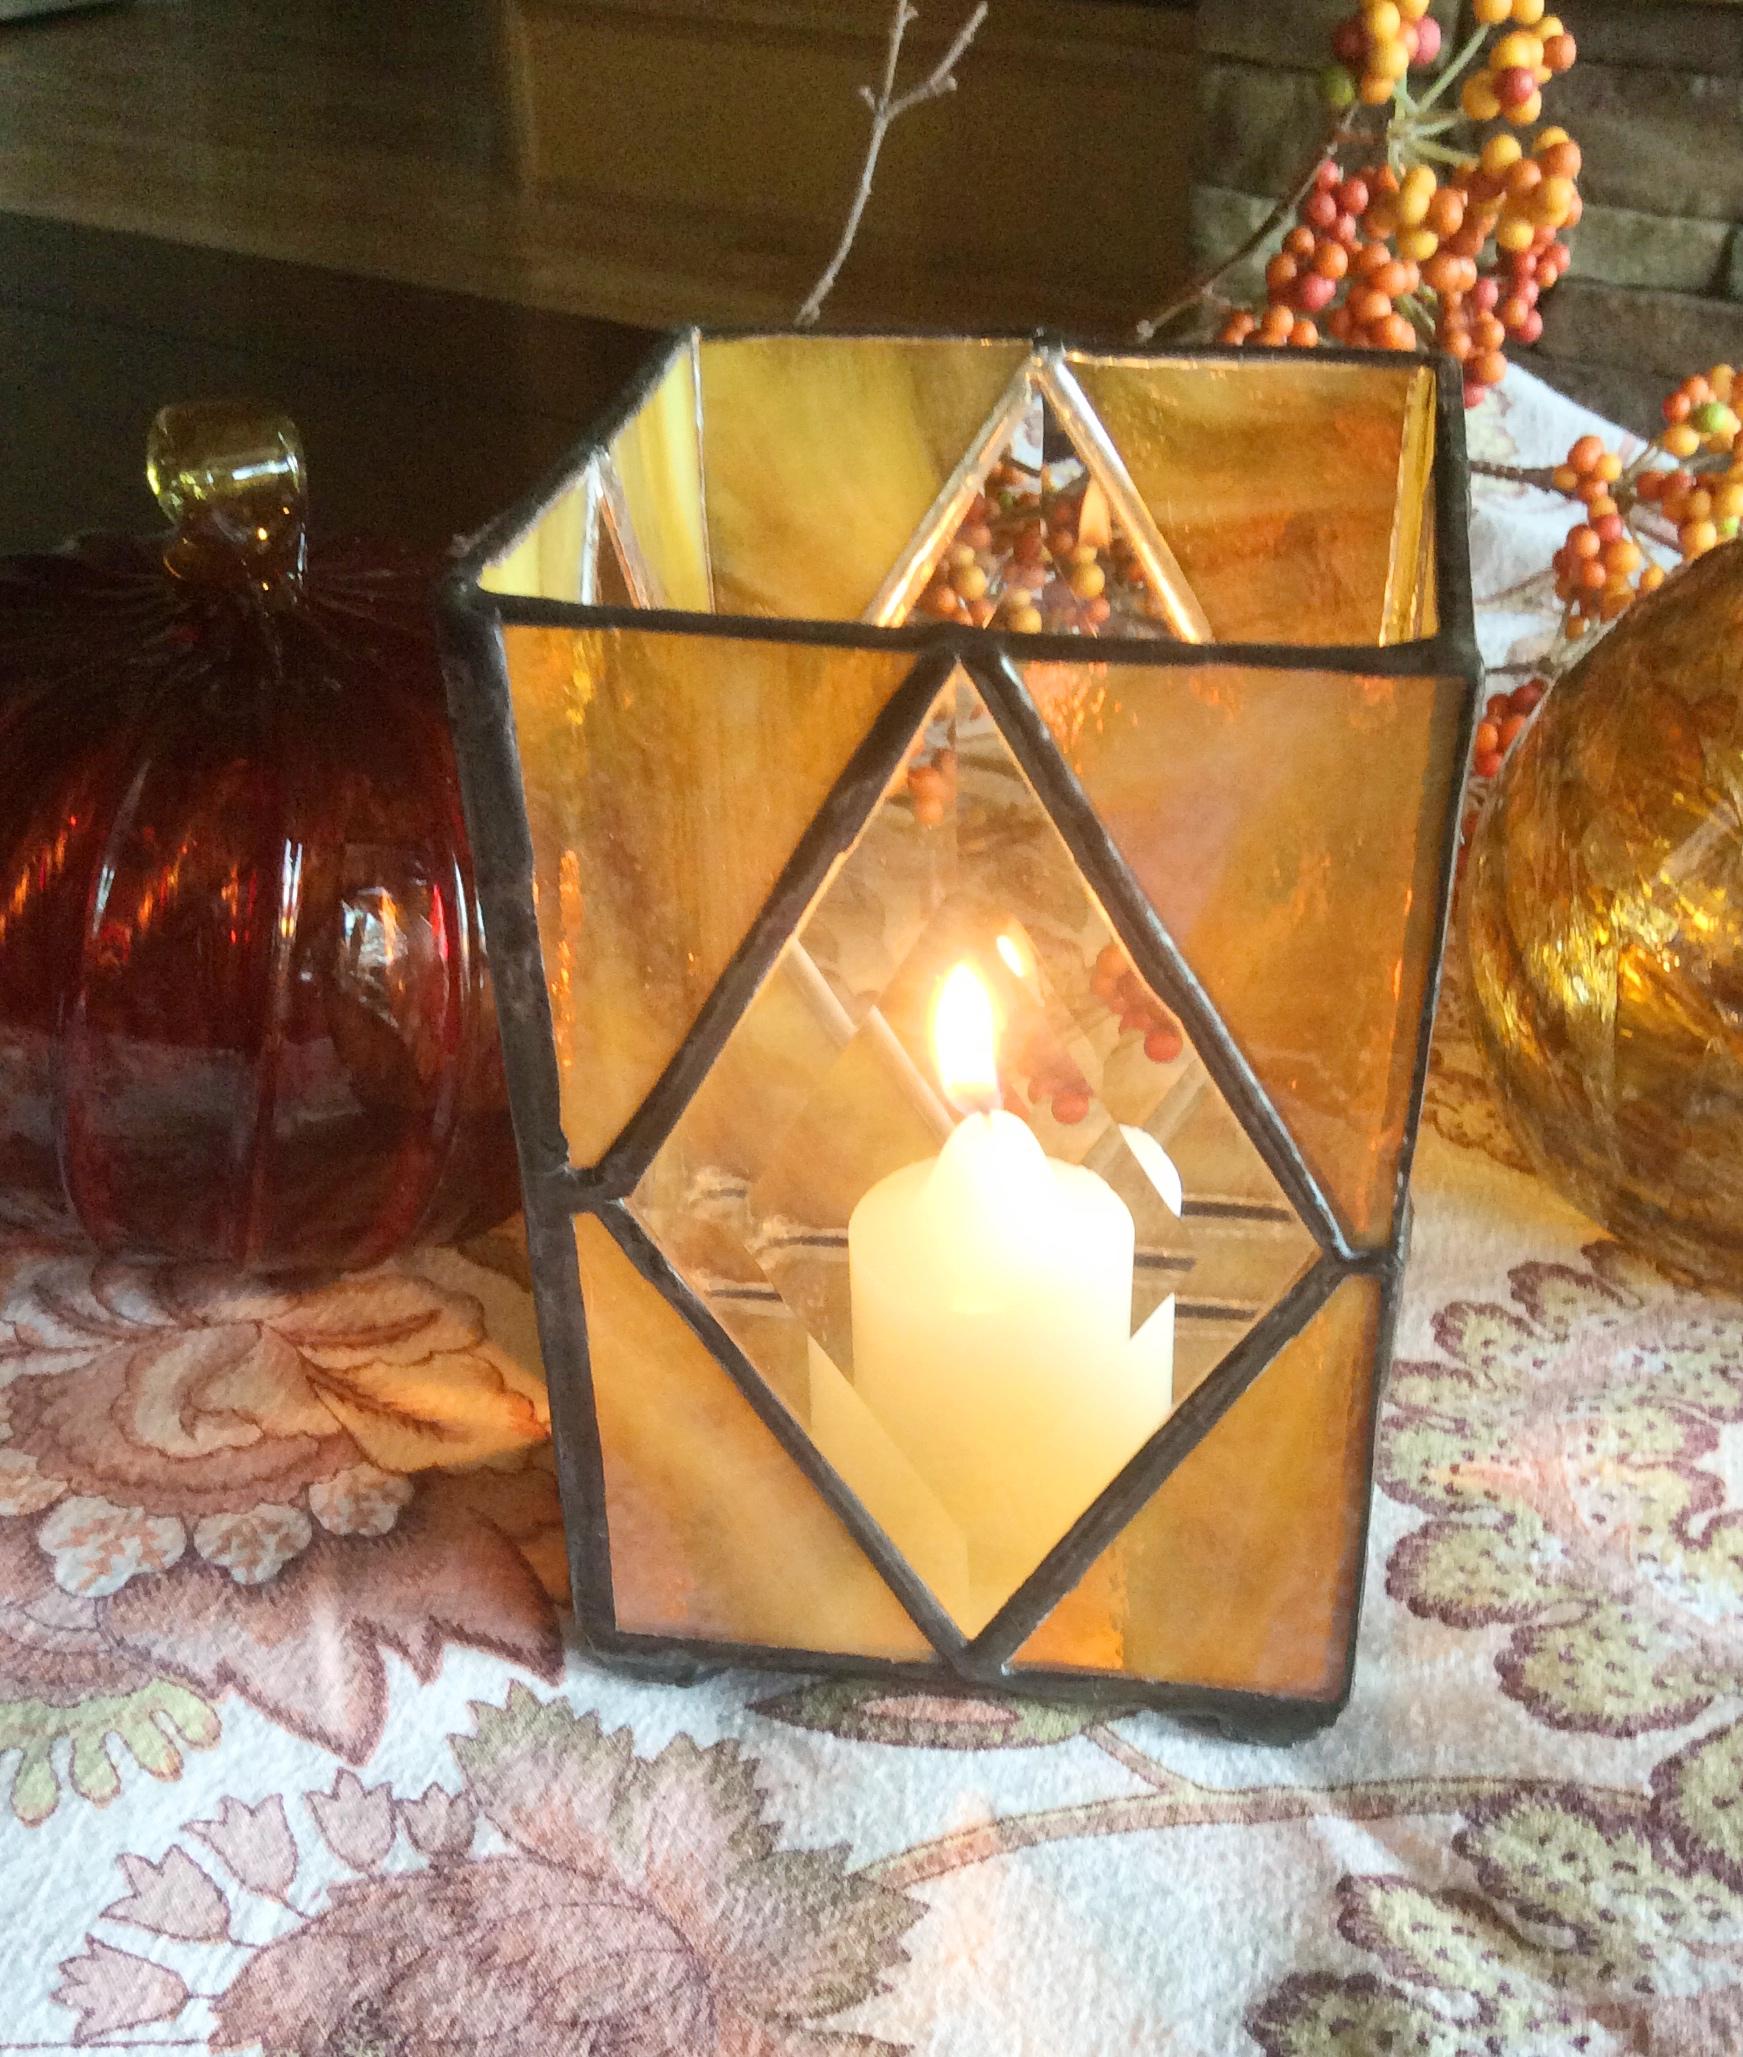 y candel 2.jpg